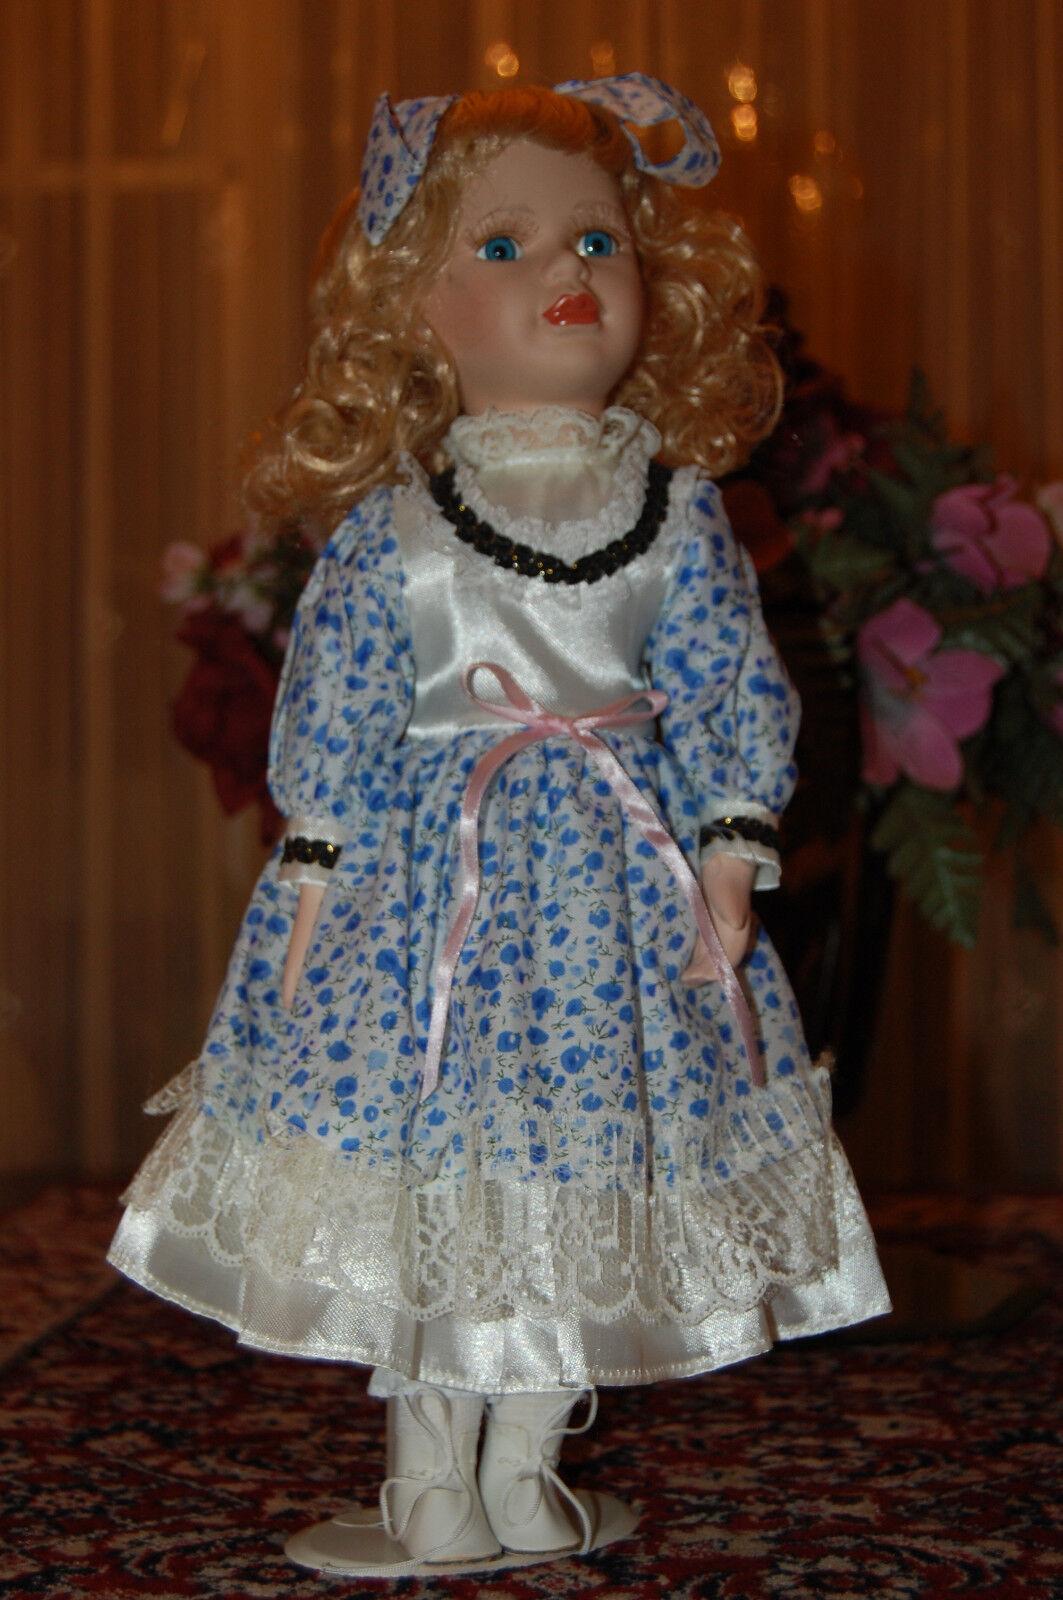 German Porcelain Doll Floral Dress 40 CM NEW in Box